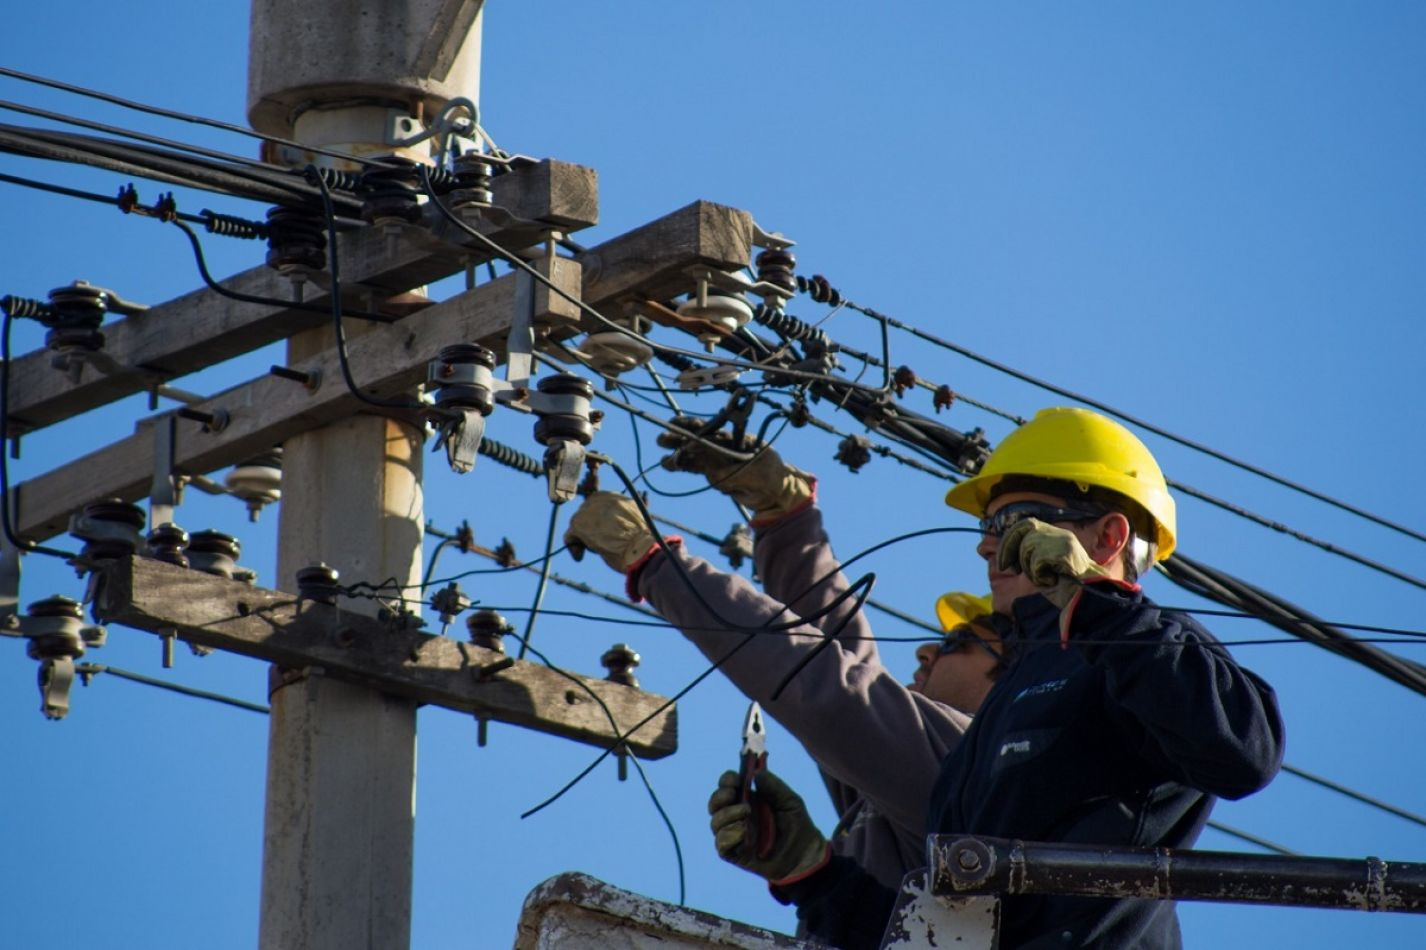 Programaron un corte de energía eléctrica para Ushuaia